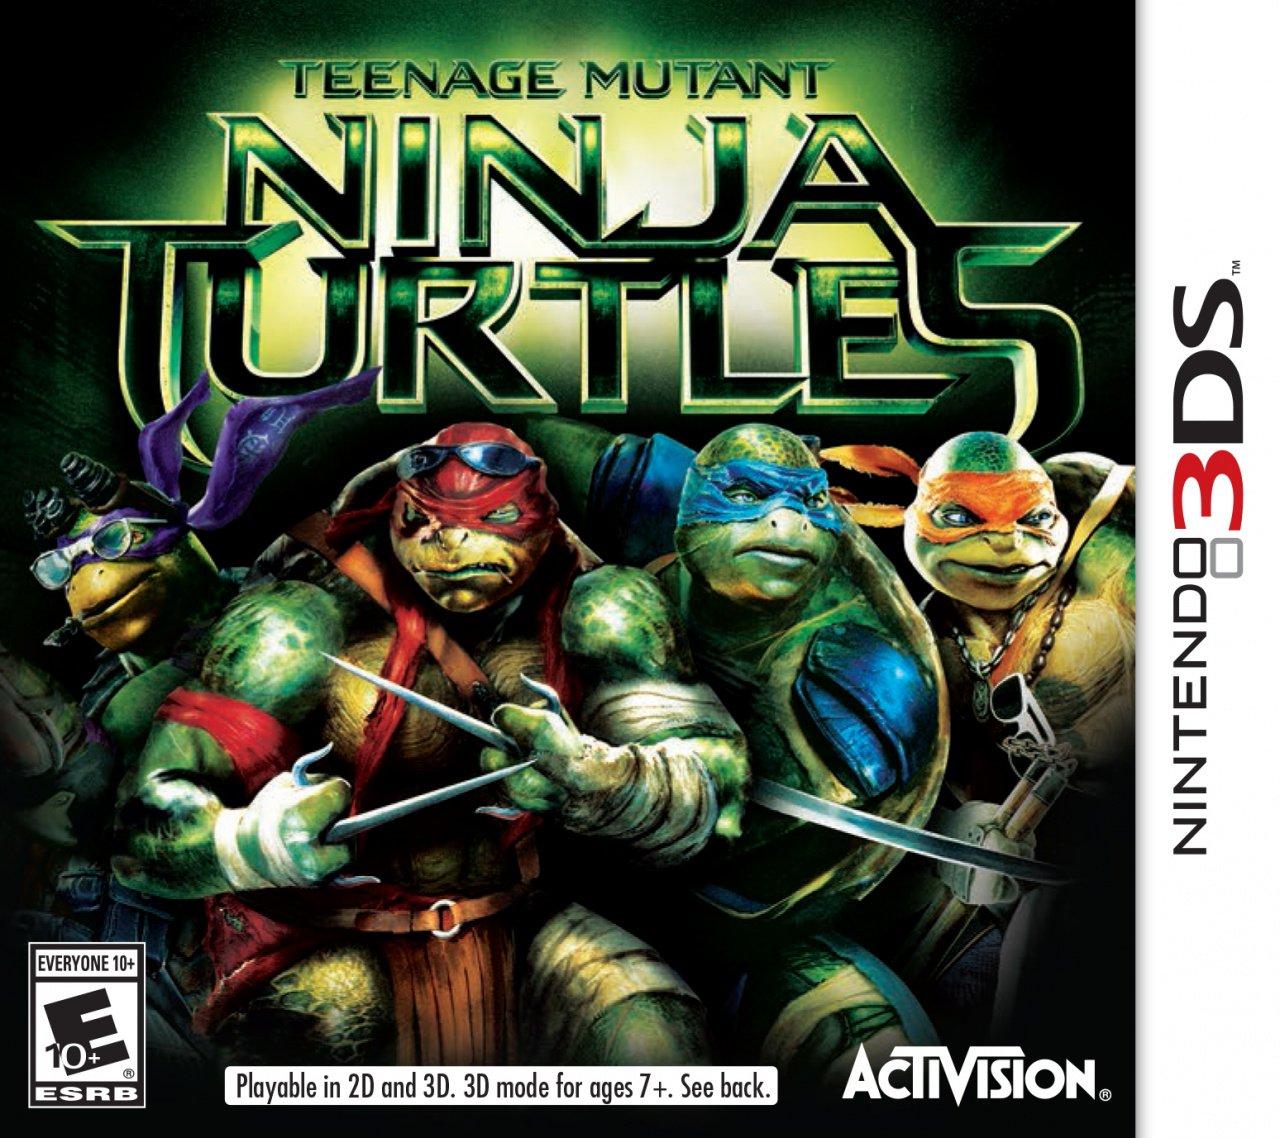 Movie based teenage mutant ninja turtles game coming to 3ds nintendo